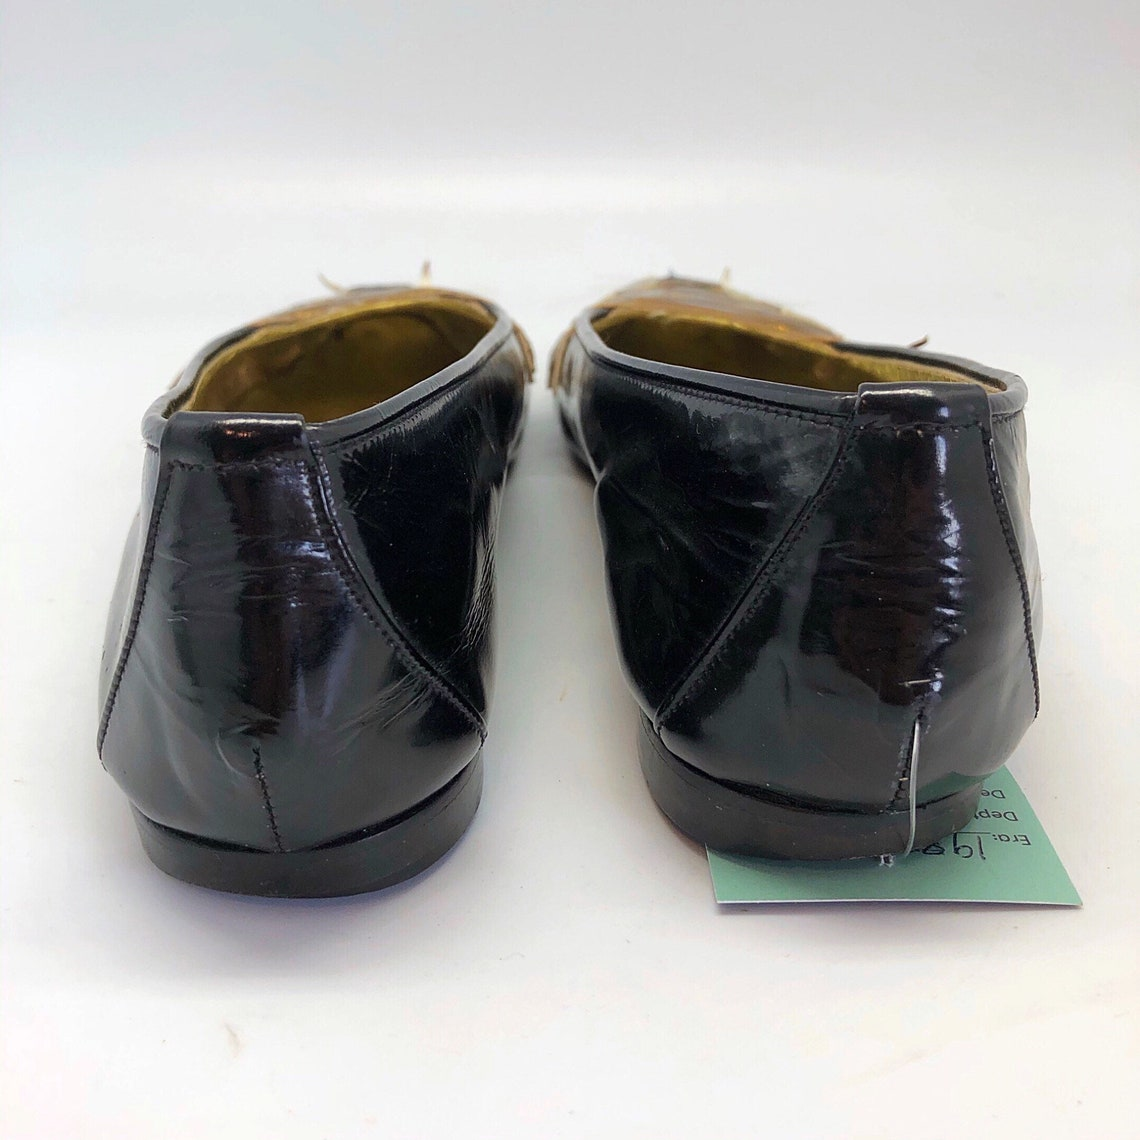 1980s SZ:7.5 38 black patent leather metallic novelty tiger face point toe flats - Scarpe alla moda gPf7Nir5 tthday nihfQ5